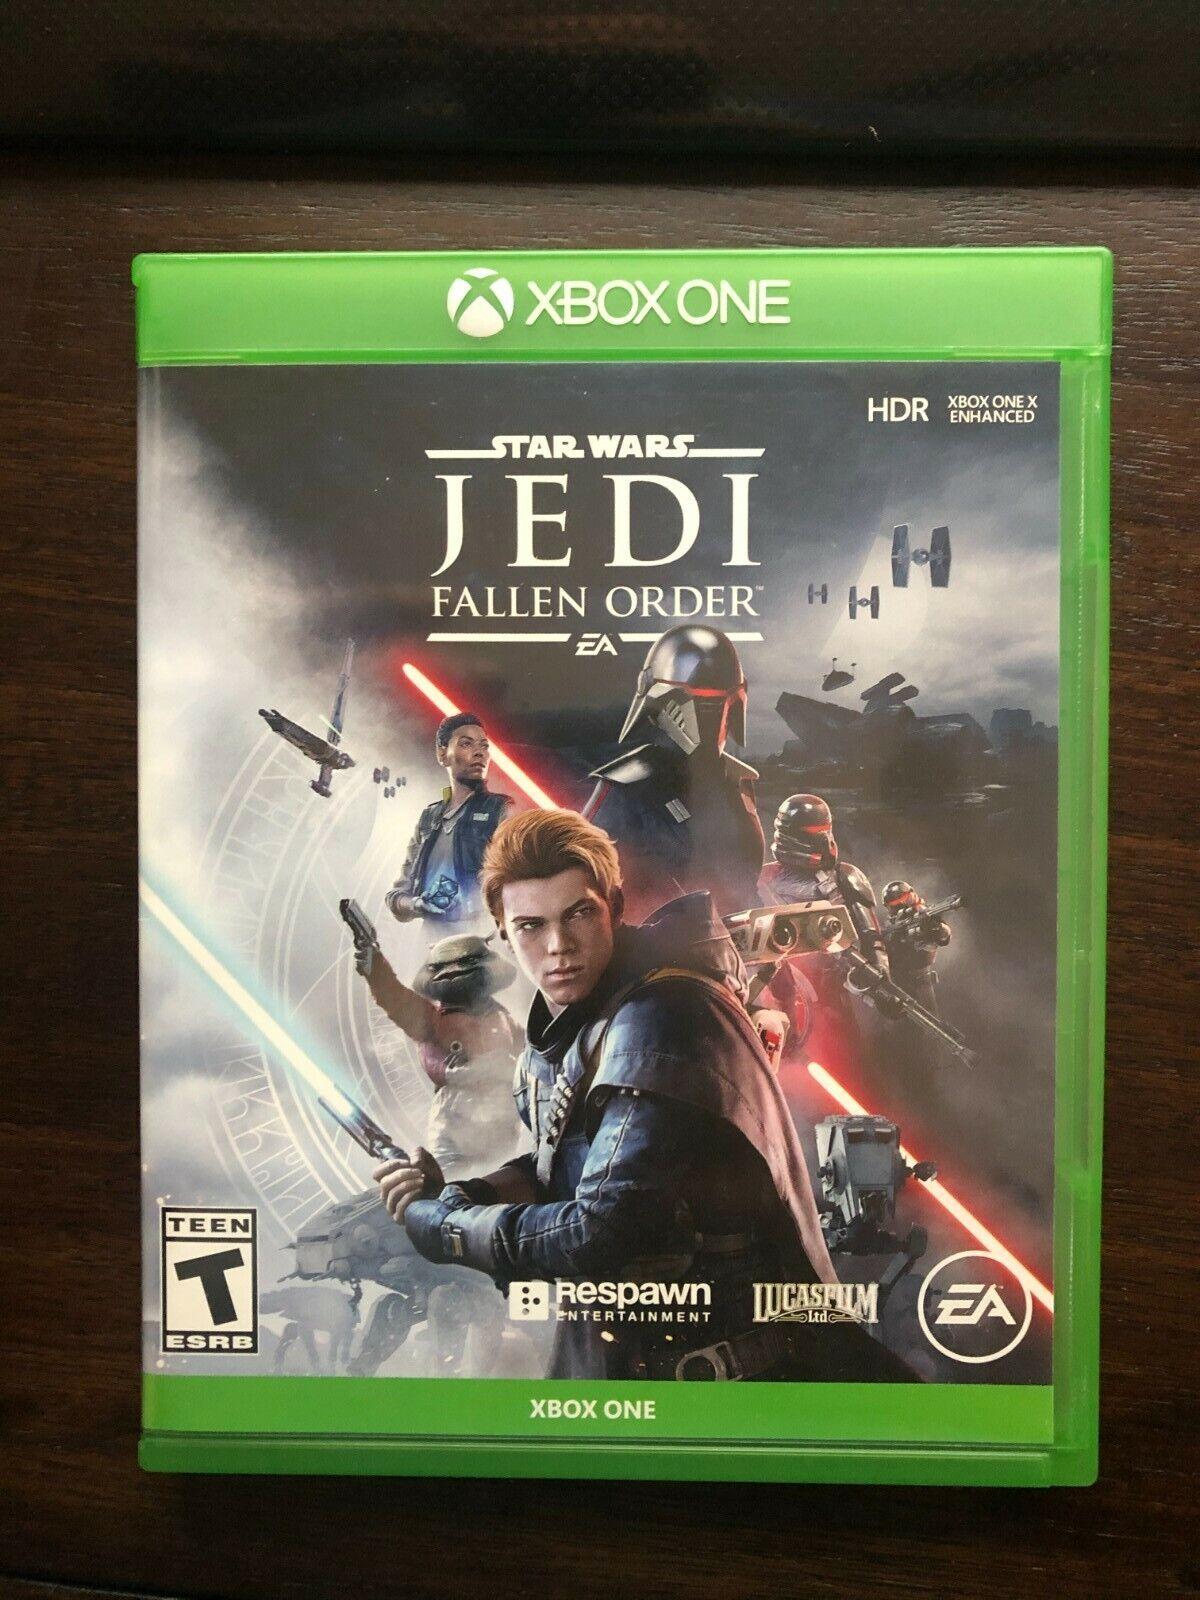 Star Wars Jedi Fallen Order - Microsoft Xbox One - $7.00